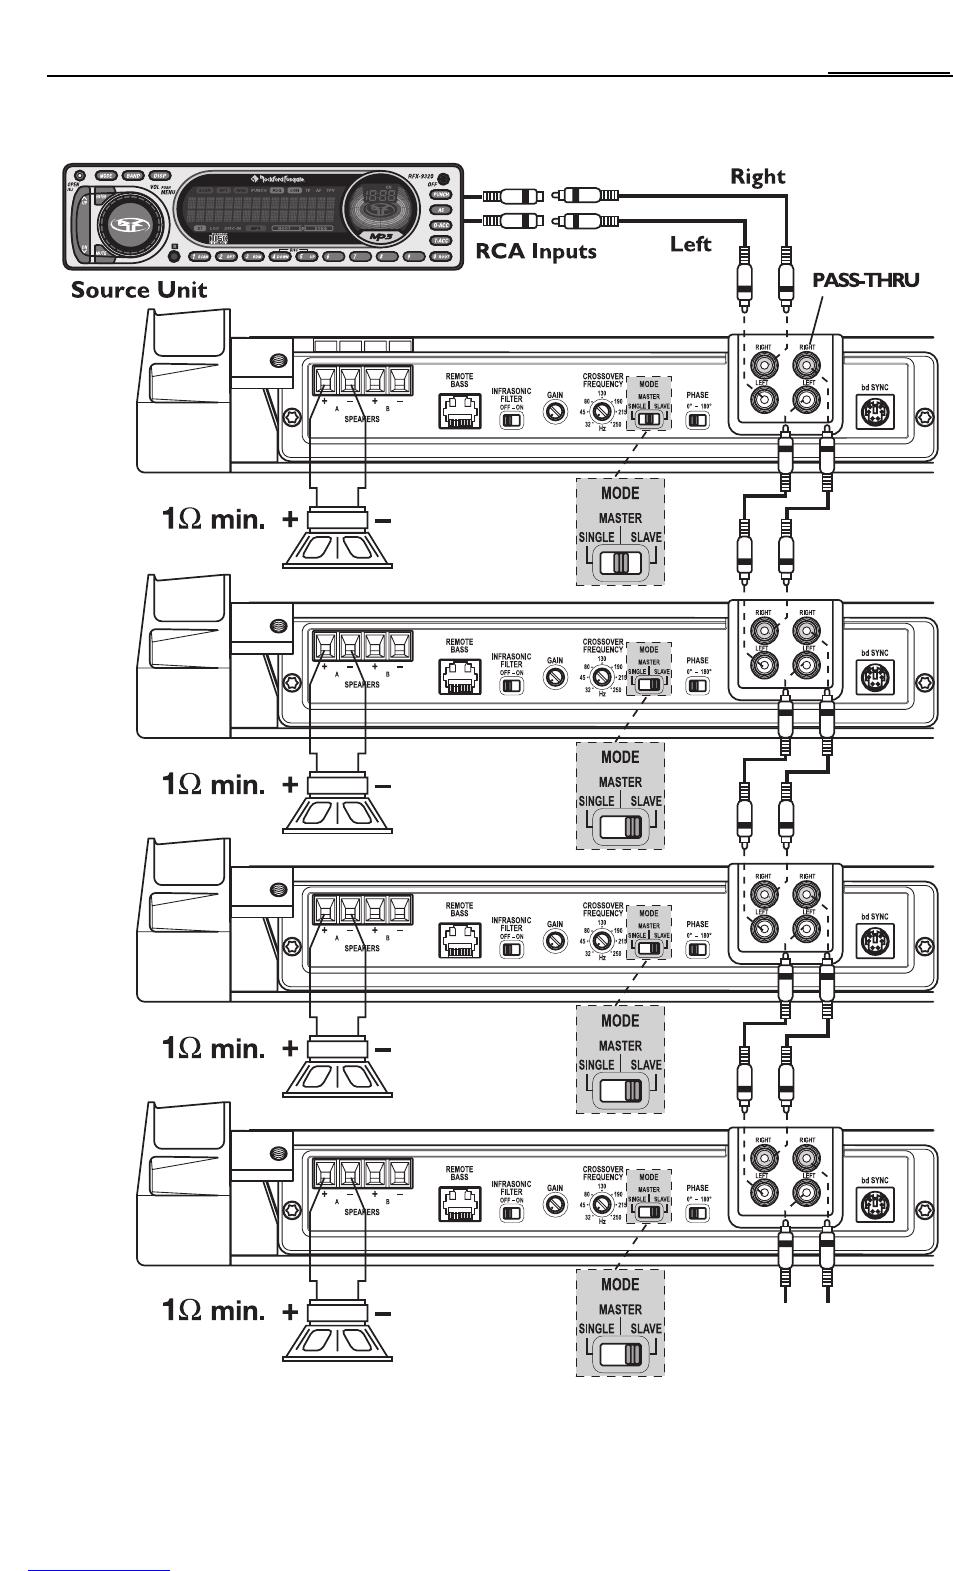 manual rockford fosgate t20001bd (page 10 of 72) (english, german, french,  italian, spanish)  libble.eu